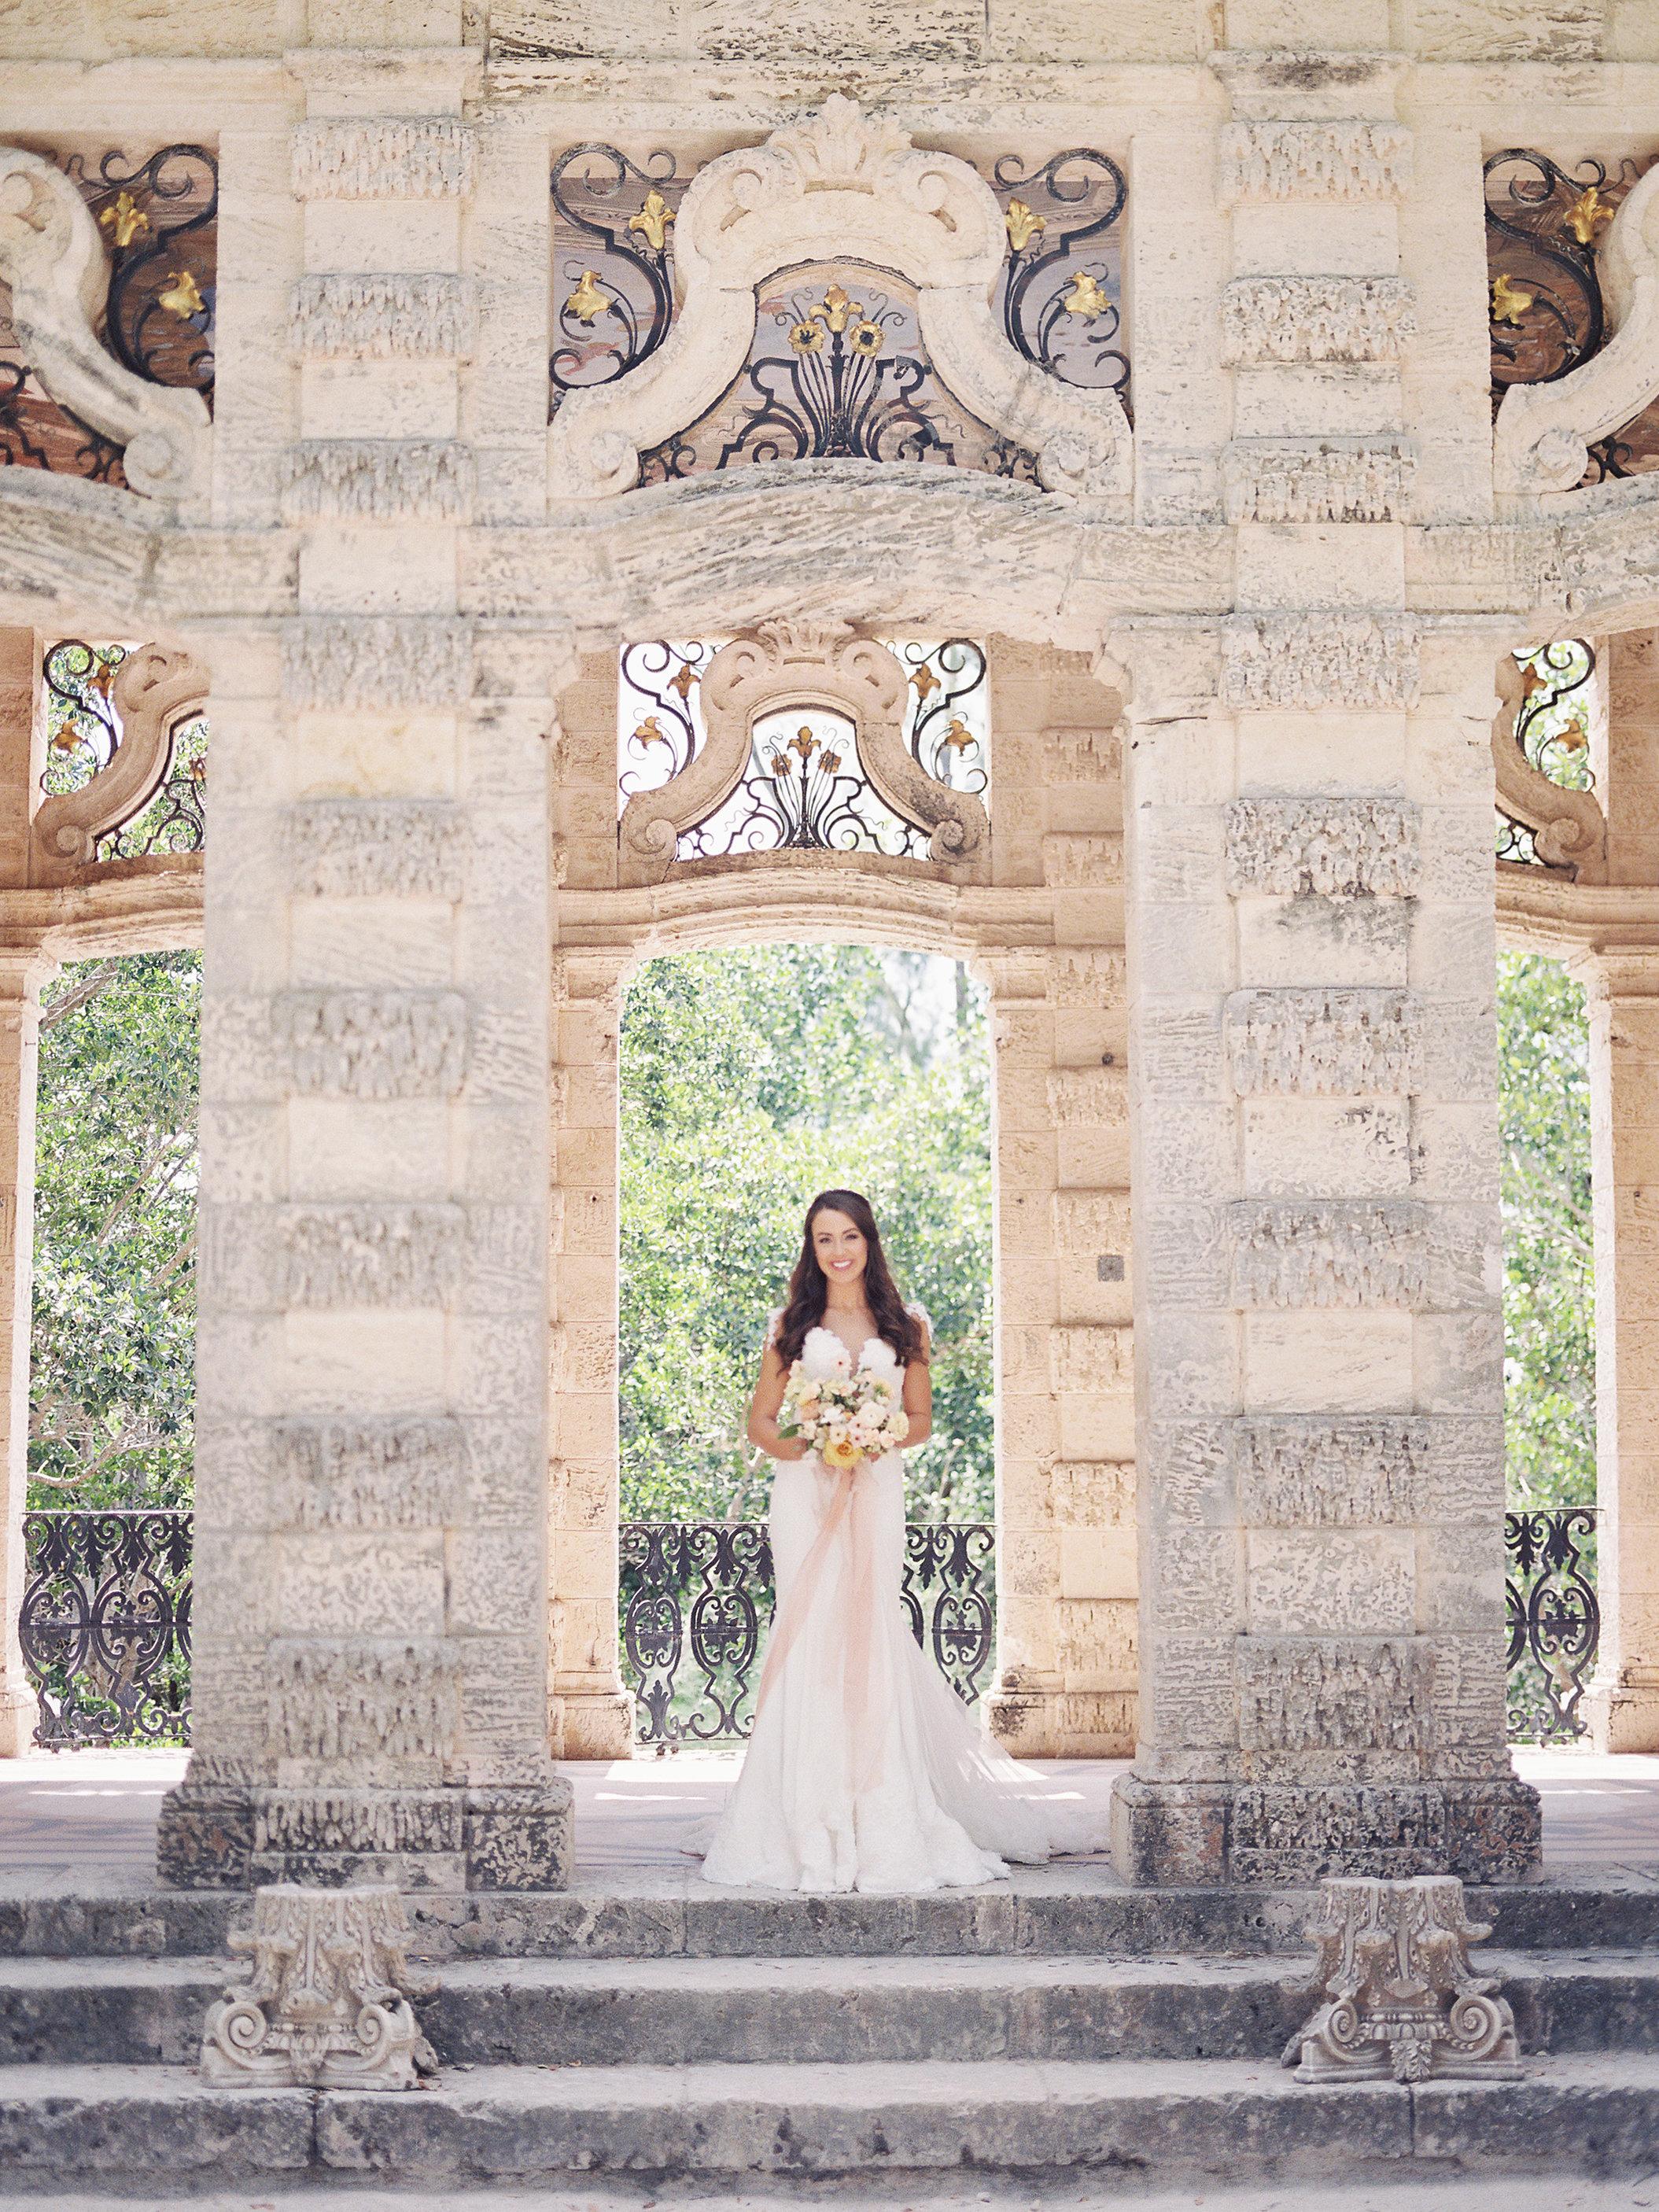 jessica-zimmerman-bridal-portrait-miami-vizcaya.jpg